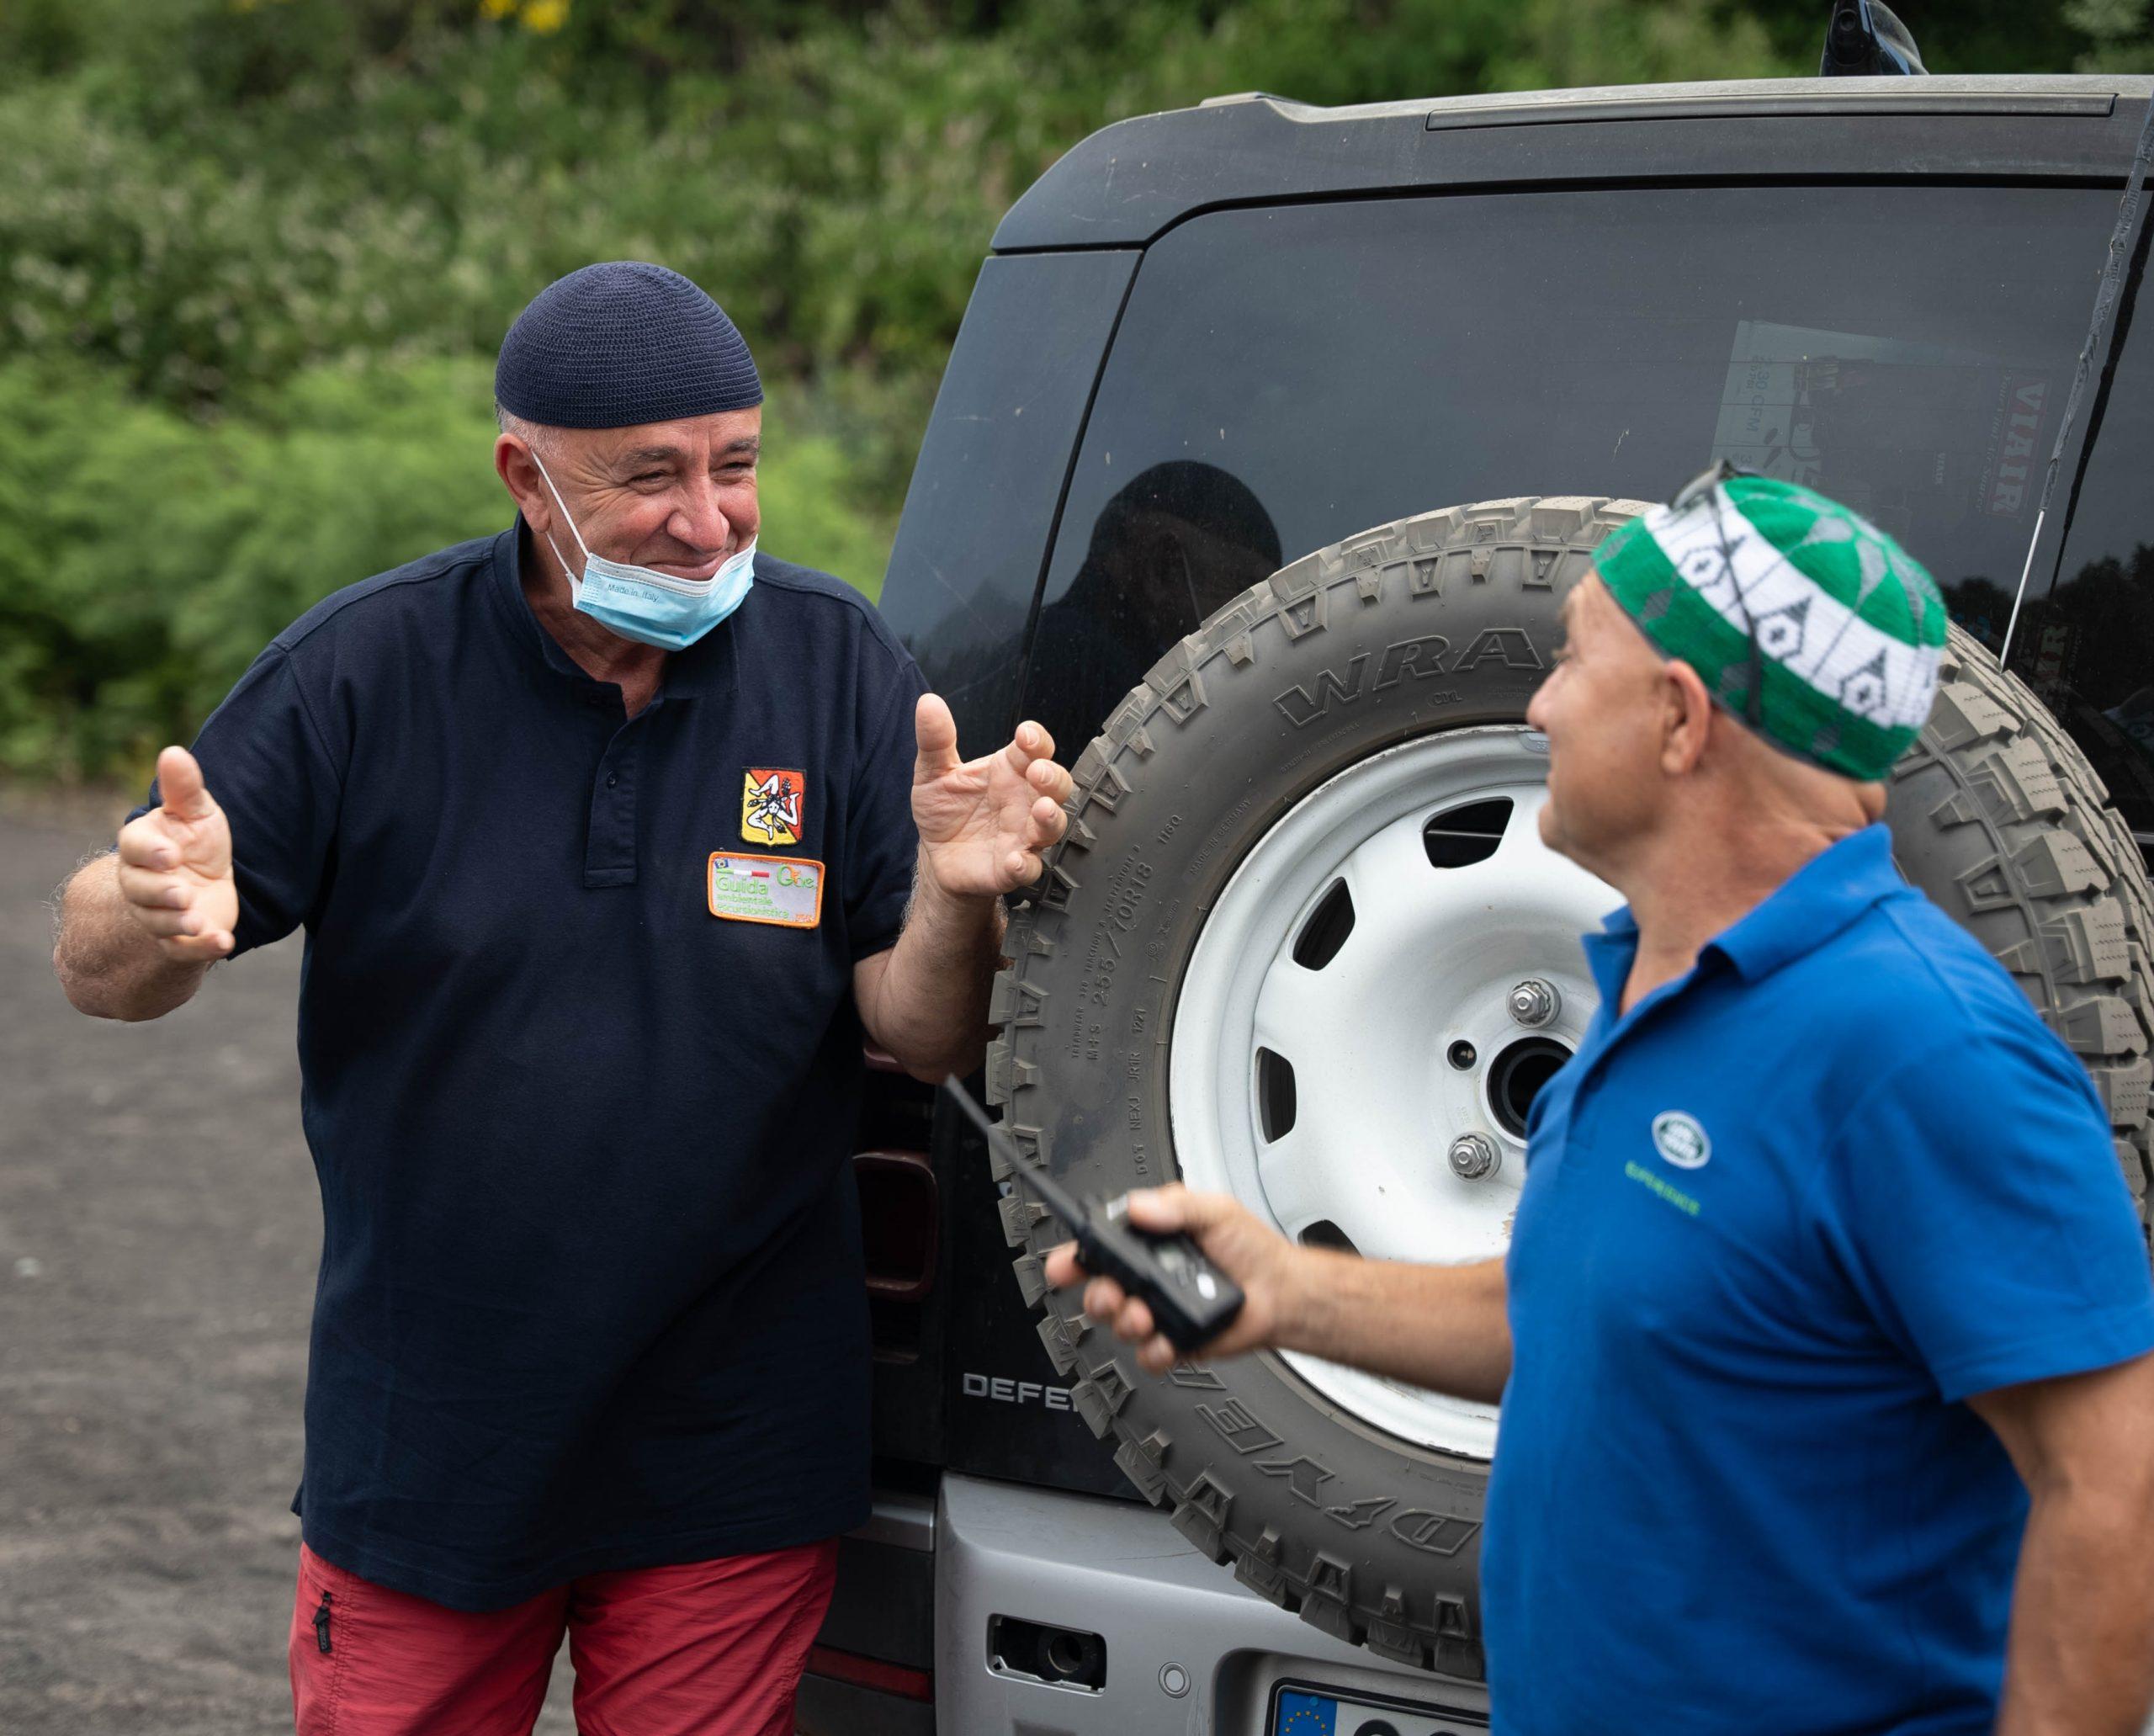 Land_Rover_Tour_Sicilia_2021_Land_Rover_Experience_Italia_-99